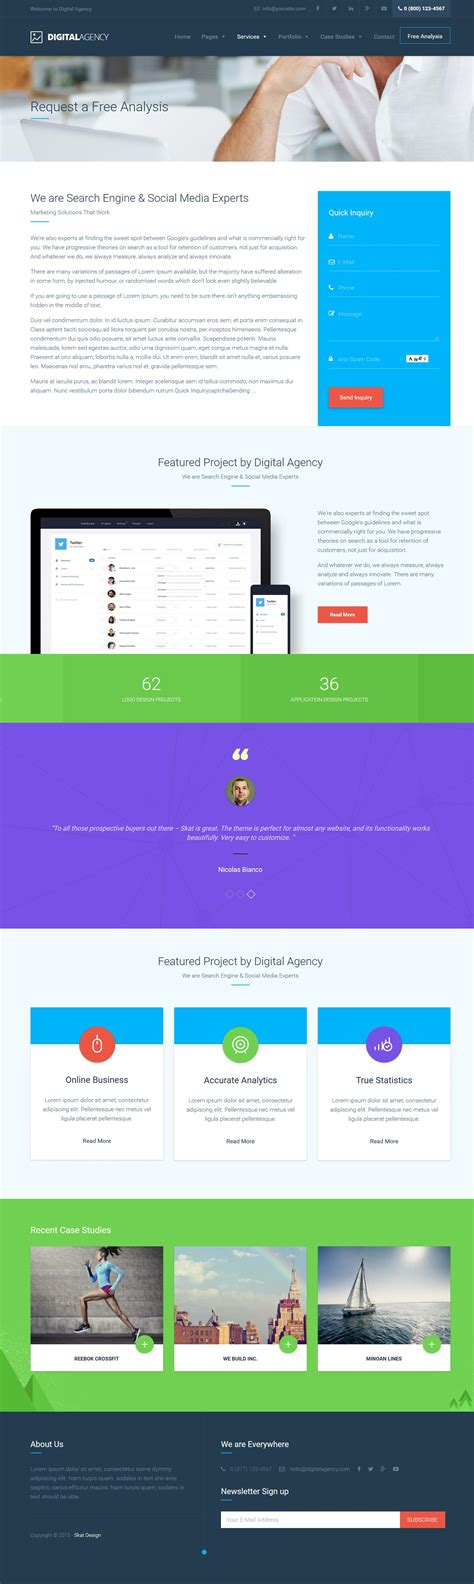 wordpress templates for advertising agencies digital agency seo marketing wordpress theme by